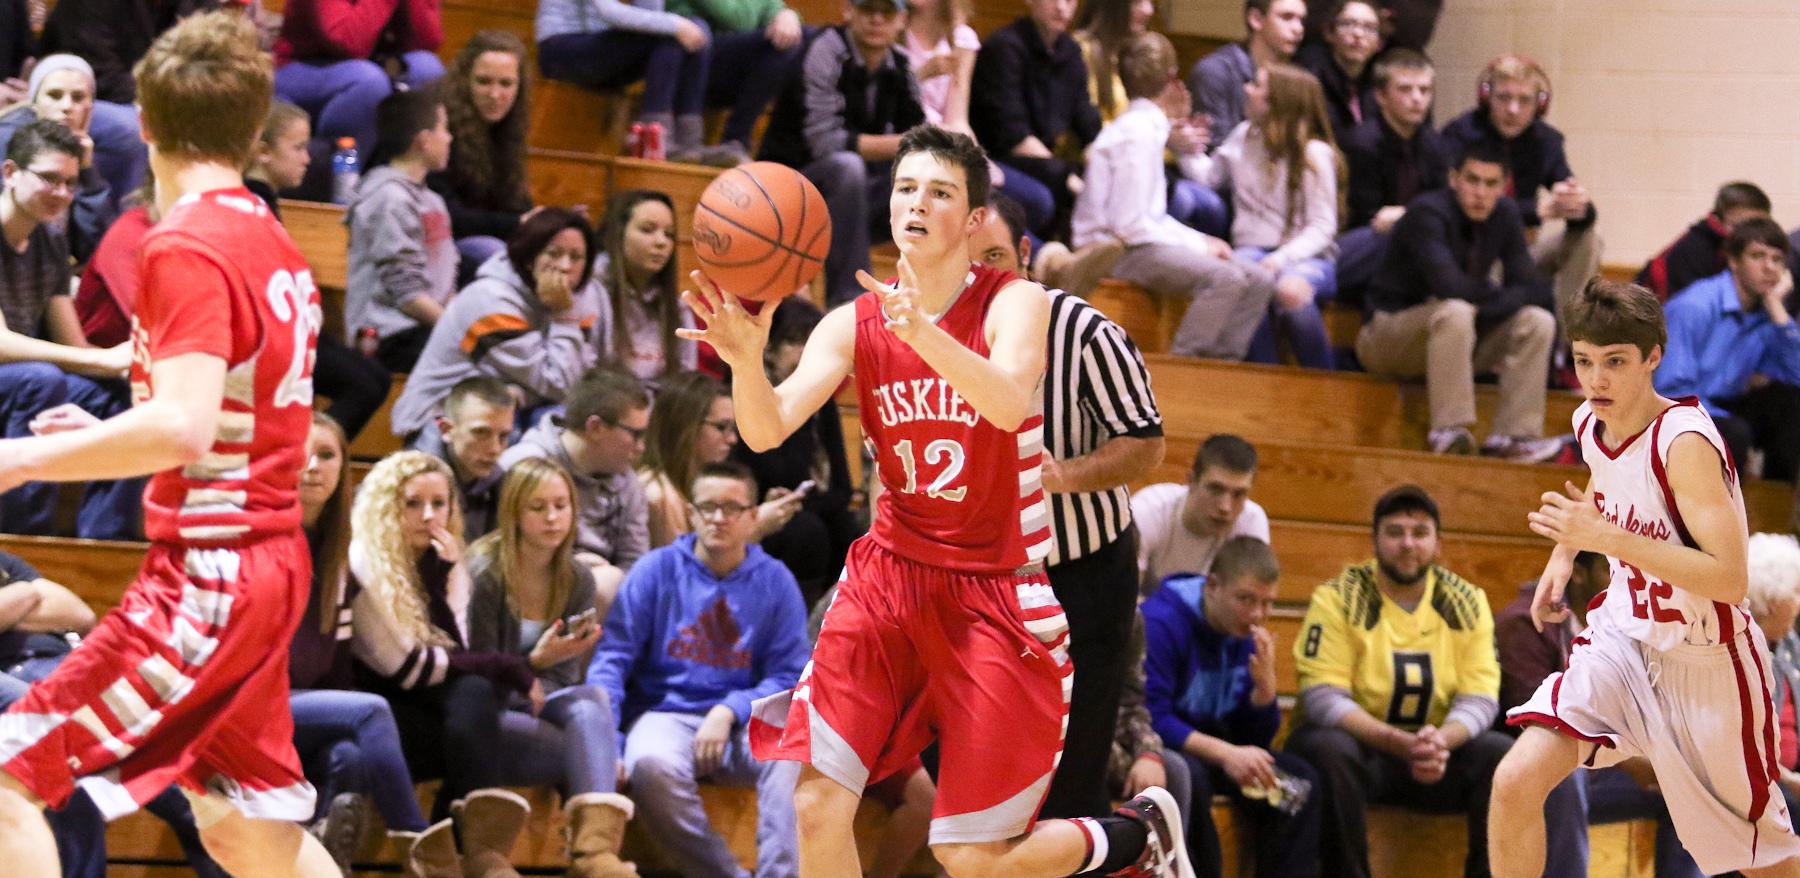 Huskies Run the Court